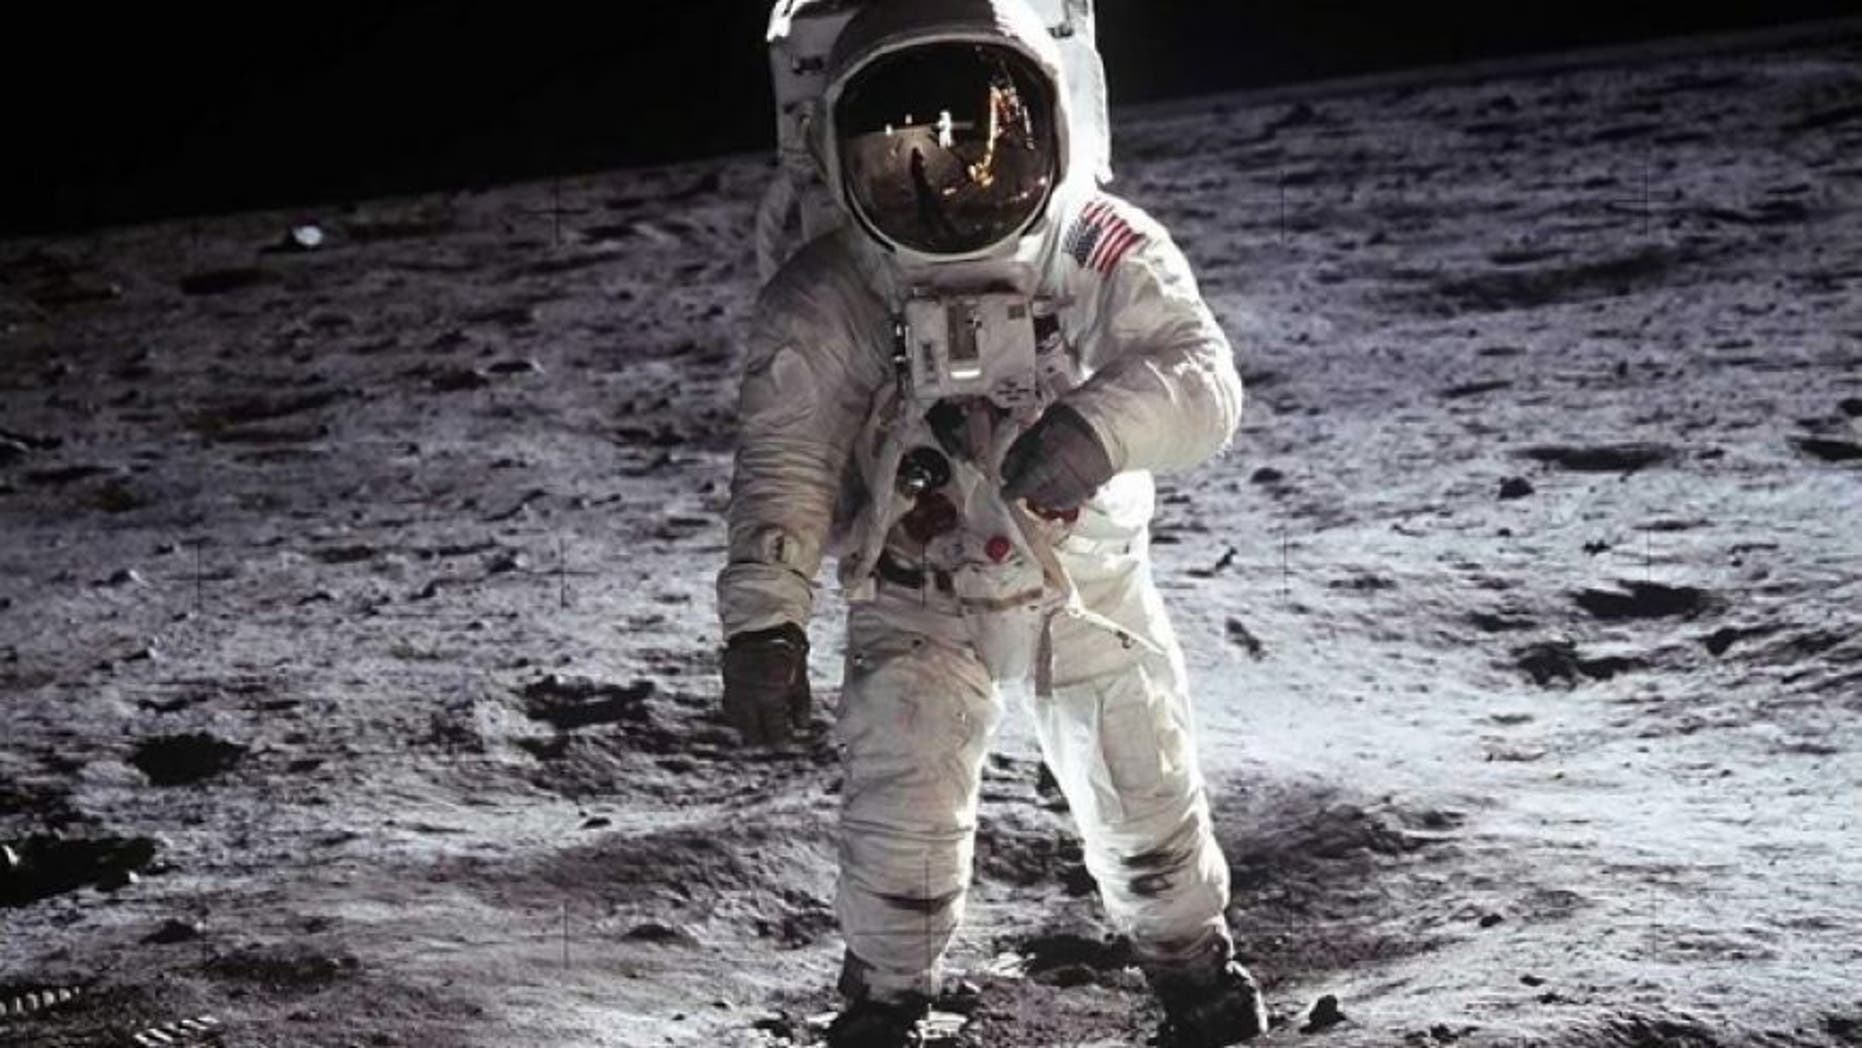 "Buzz Aldrin, Apollo 11, 1969: Astronaut Buzz Aldrin, lunar module pilot, walks on the surface of the Moon near the leg of the Lunar Module ""Eagle"" during the Apollo 11 extravehicular activity (EVA). Astronaut Neil A. Armstrong, commander, took this photograph with a 70mm lunar surface camera.  (NASA)"